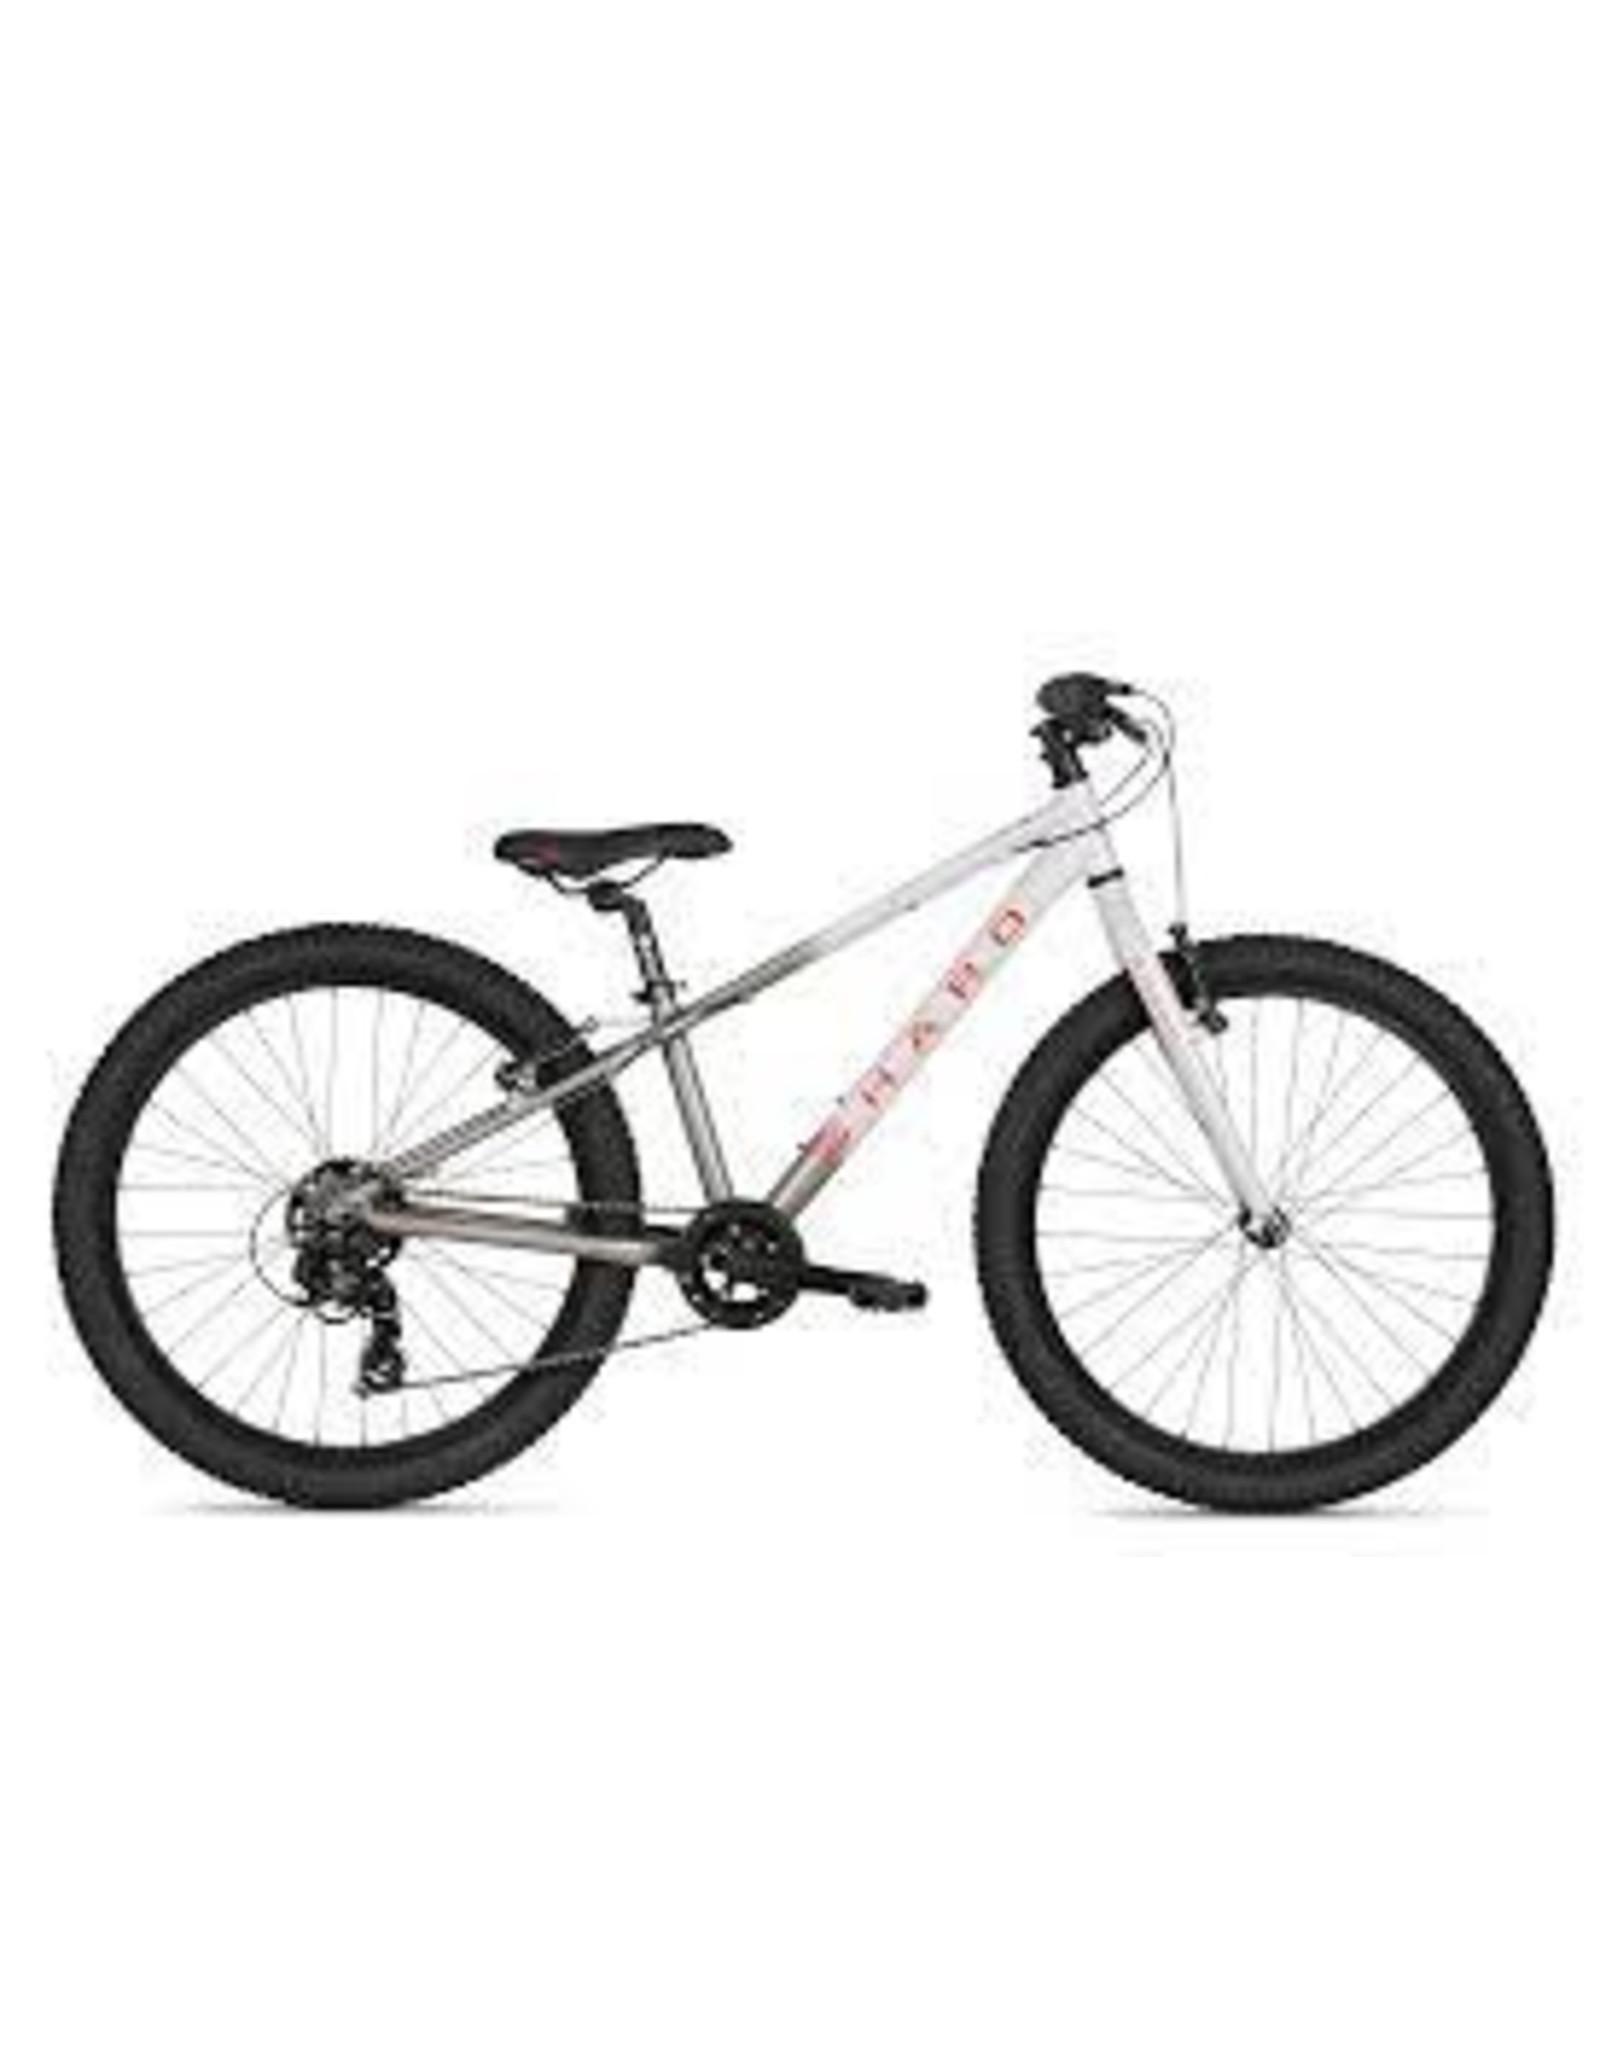 Haro Bikes 21 Haro FL 24+ Grey/Charcoal Fade